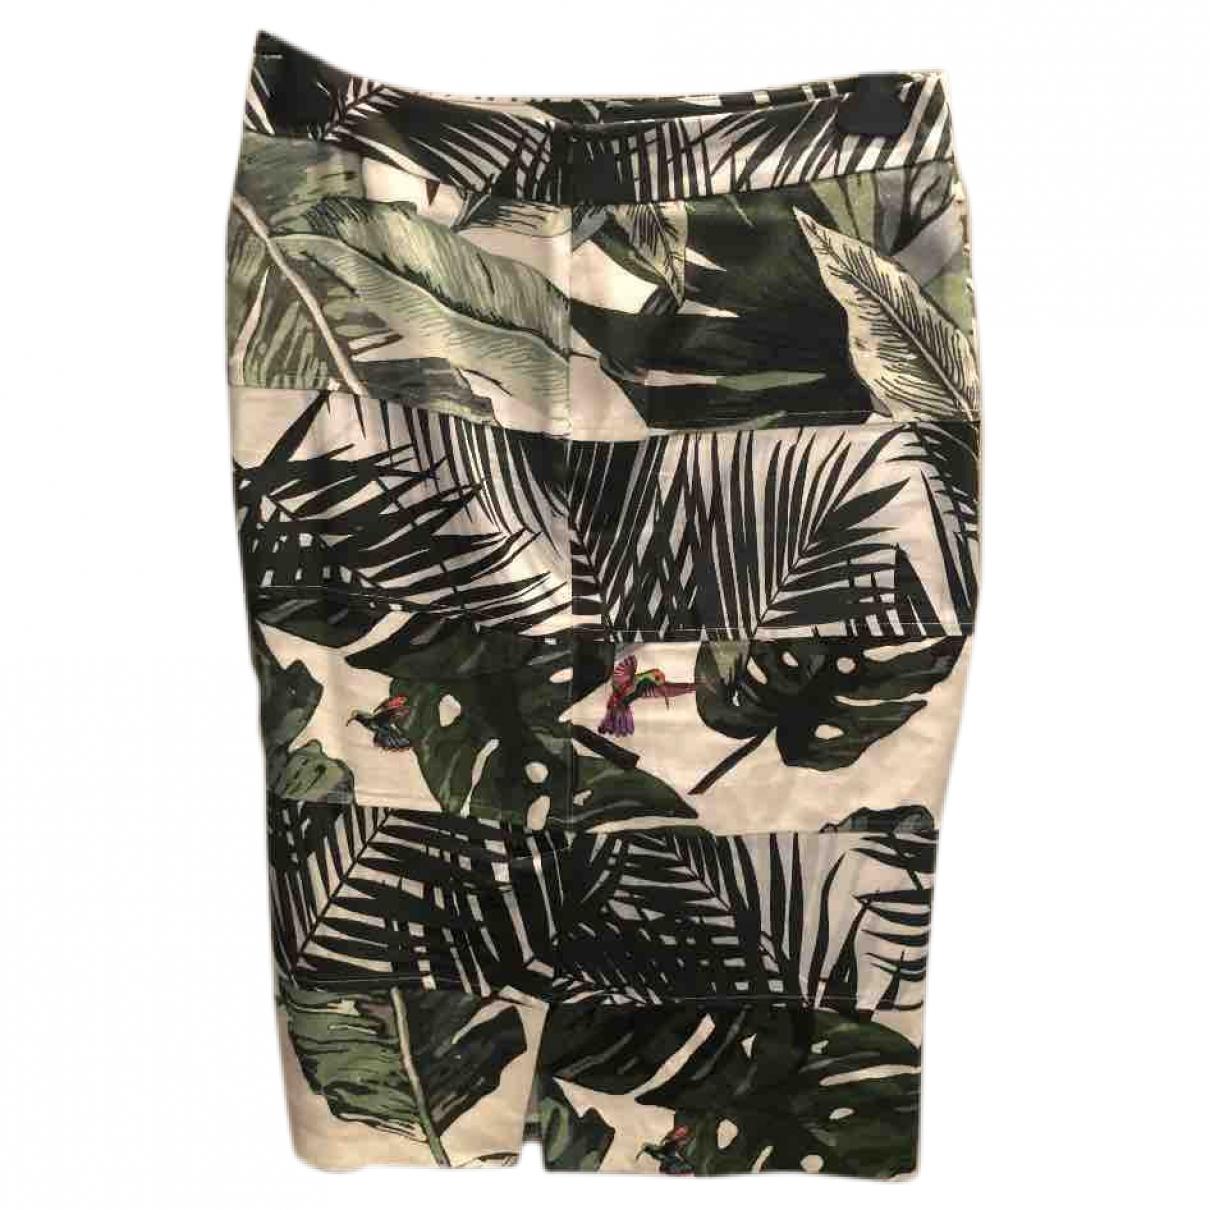 Max Mara \N Black Cotton skirt for Women 12 US